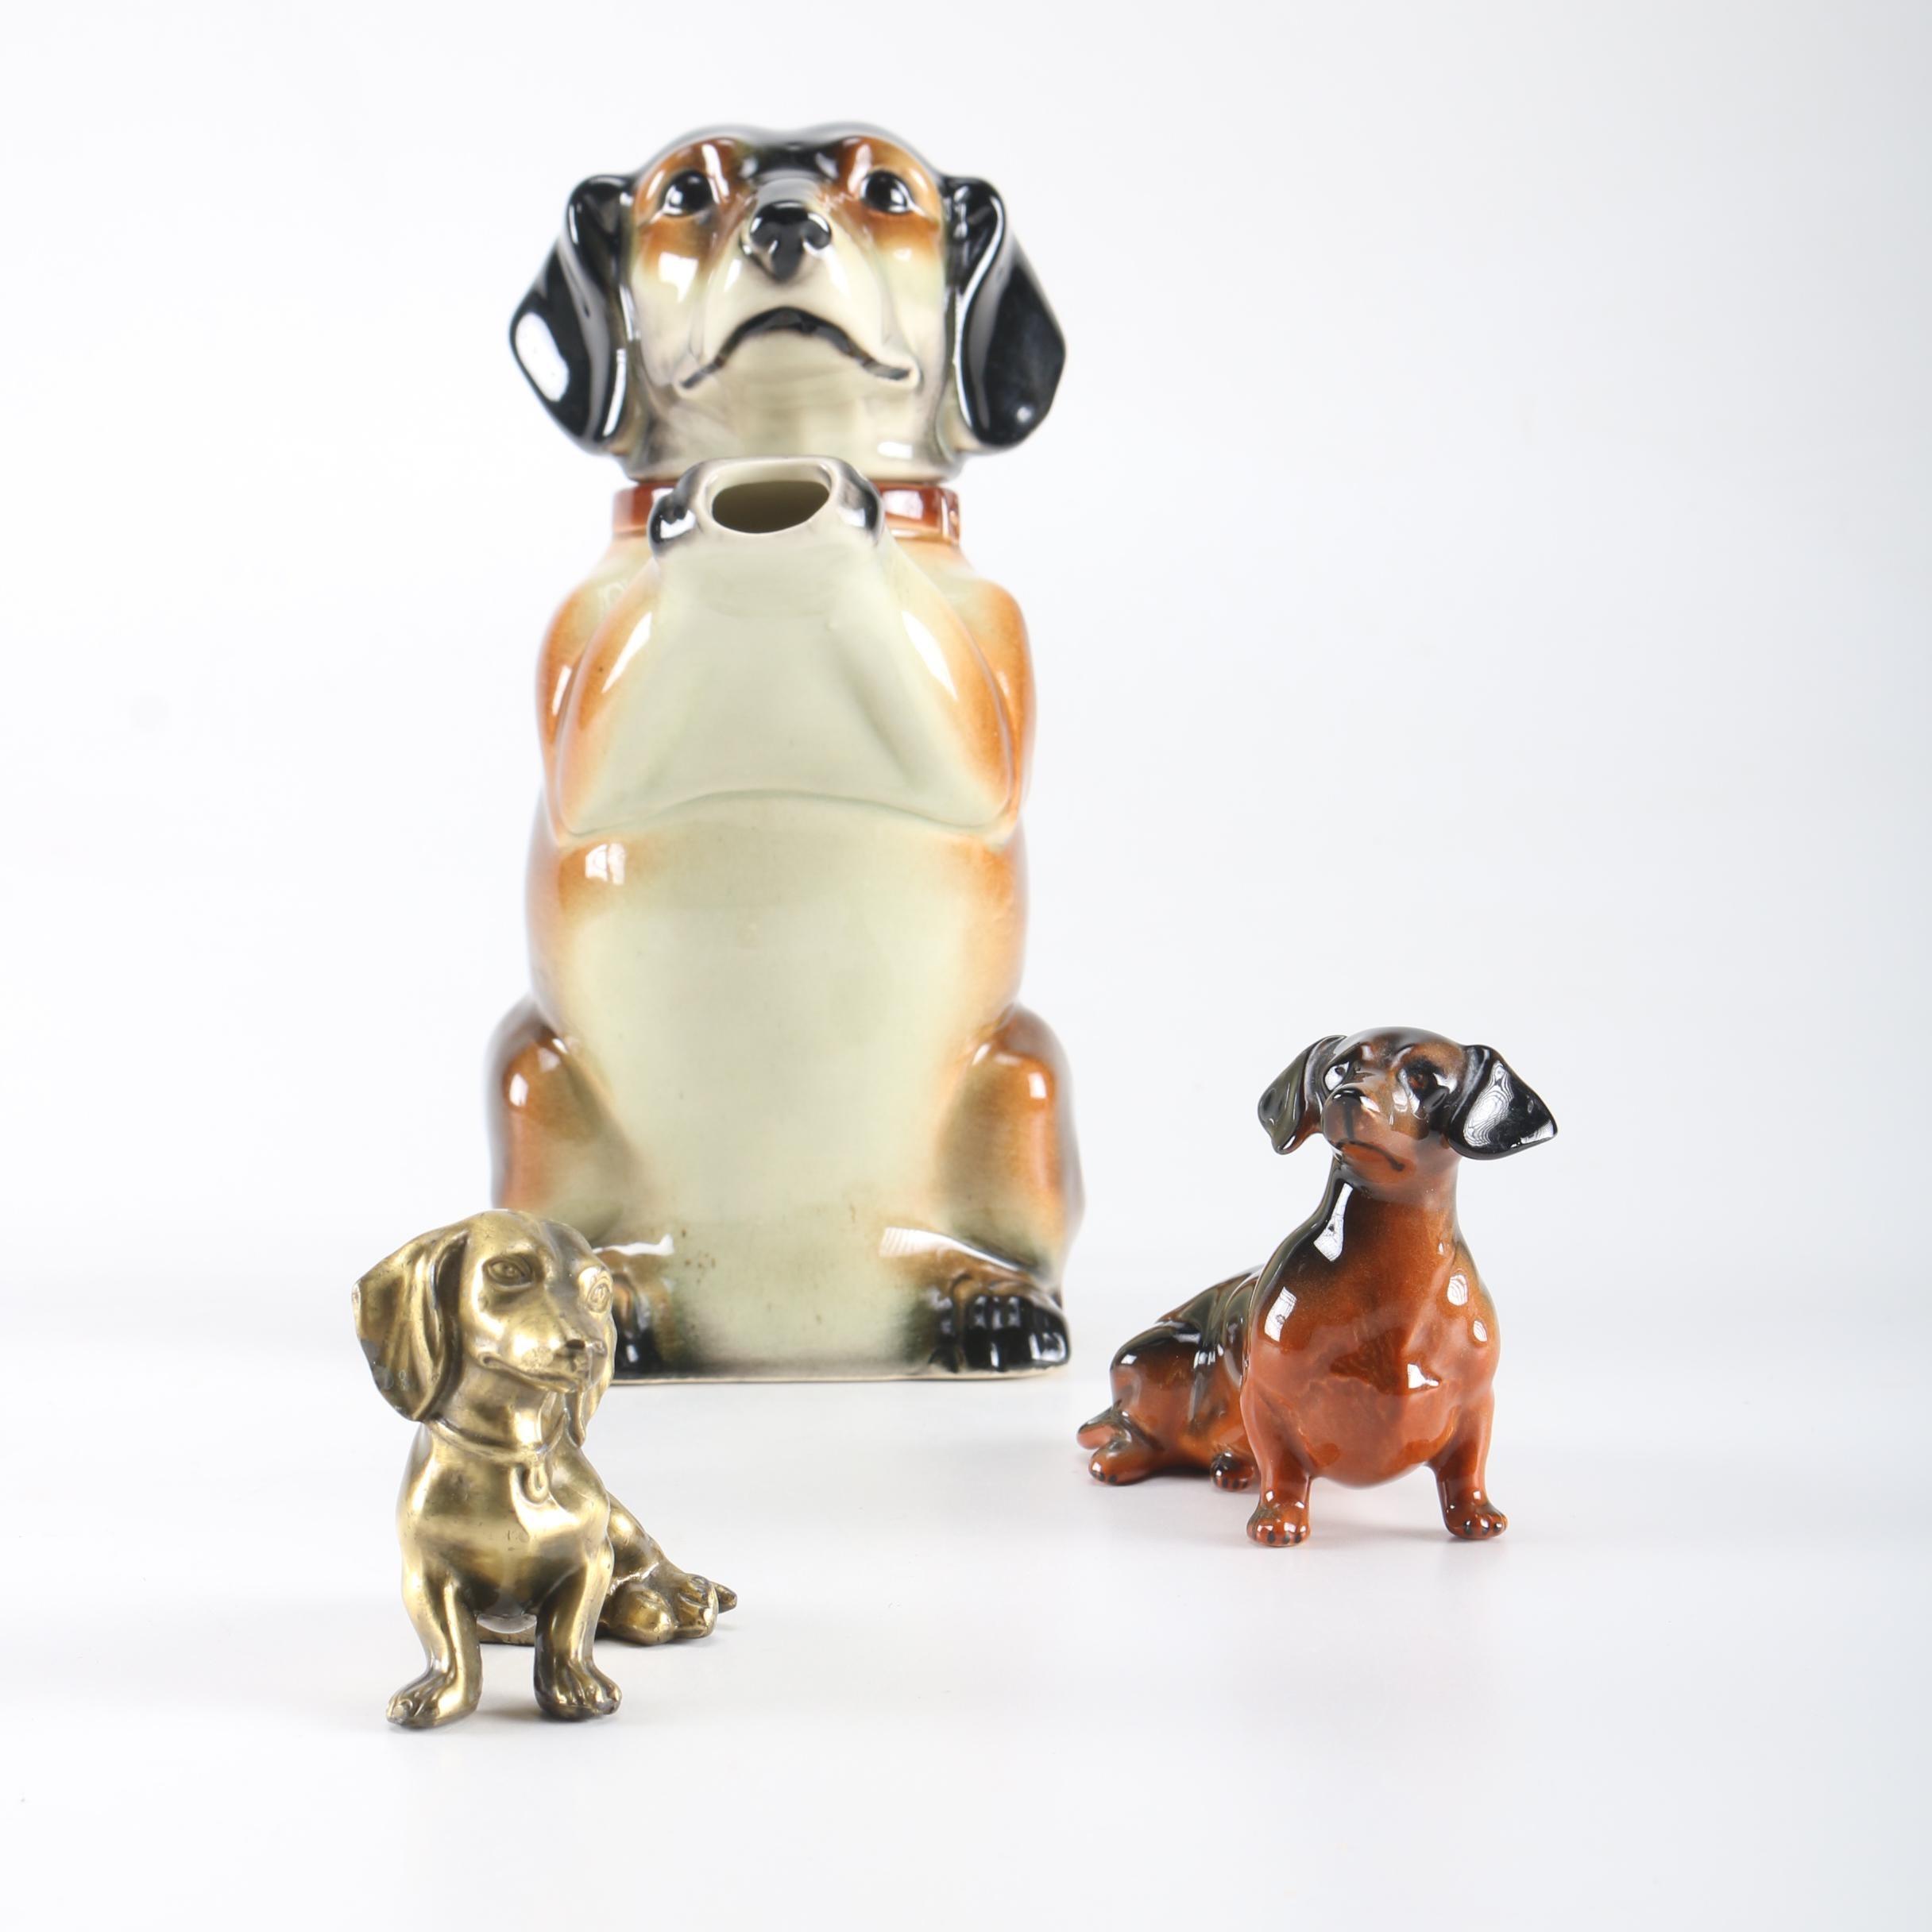 Earphila Dachshund Figural Teapot and Dachshund  Figurines